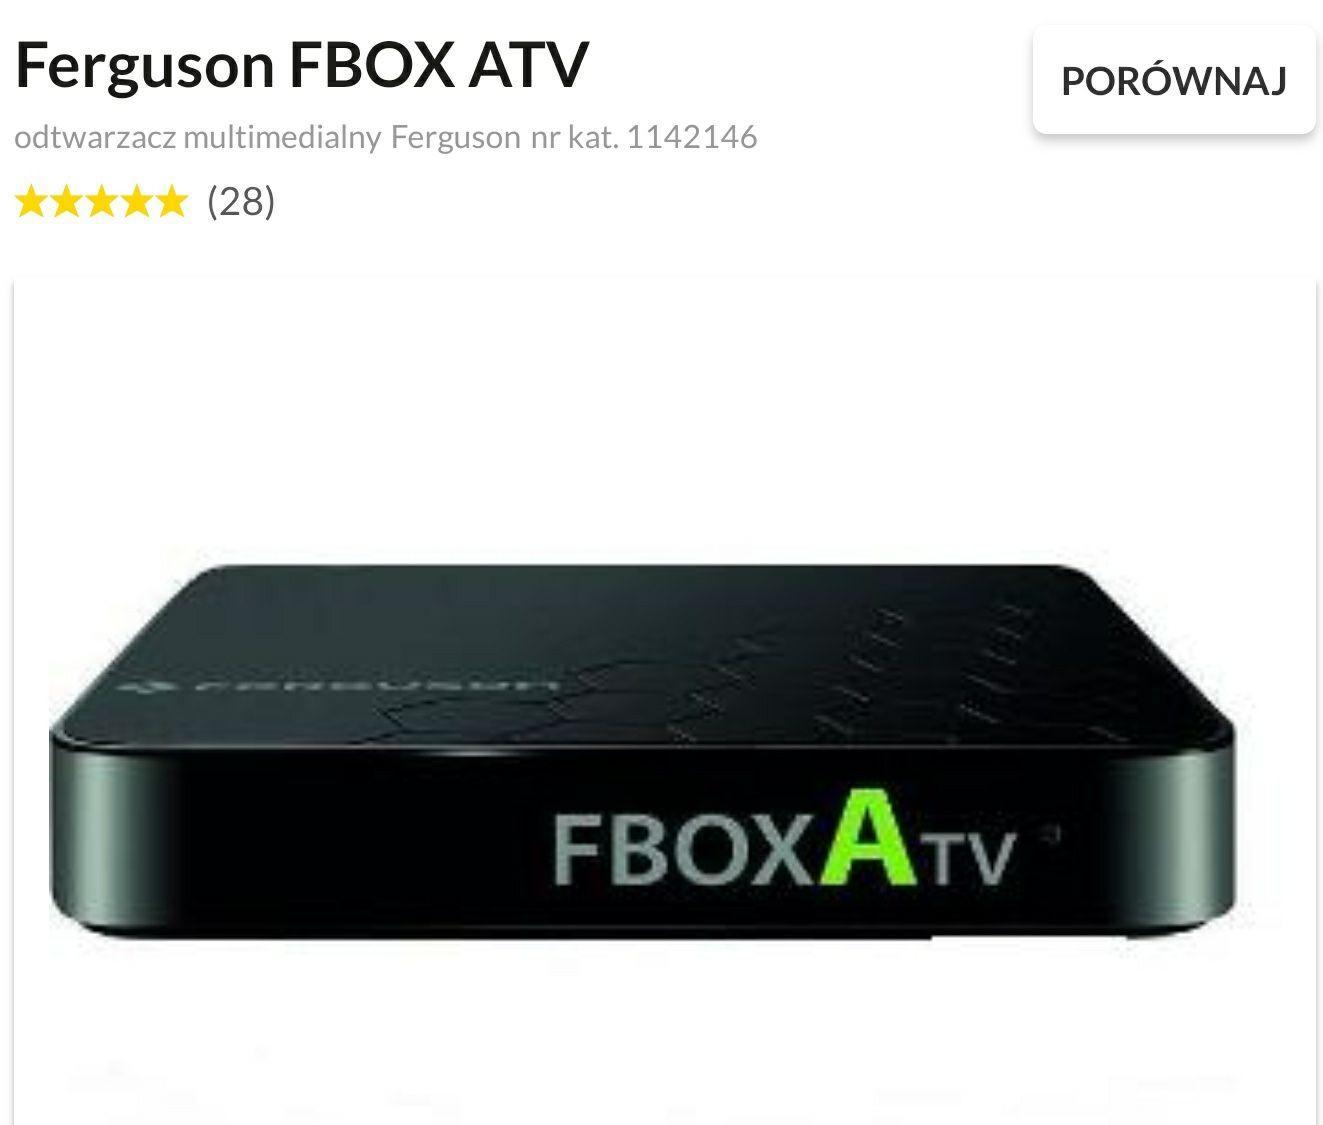 Ferguson Fbox ATV - 4K HDR TV BOX (HD music)